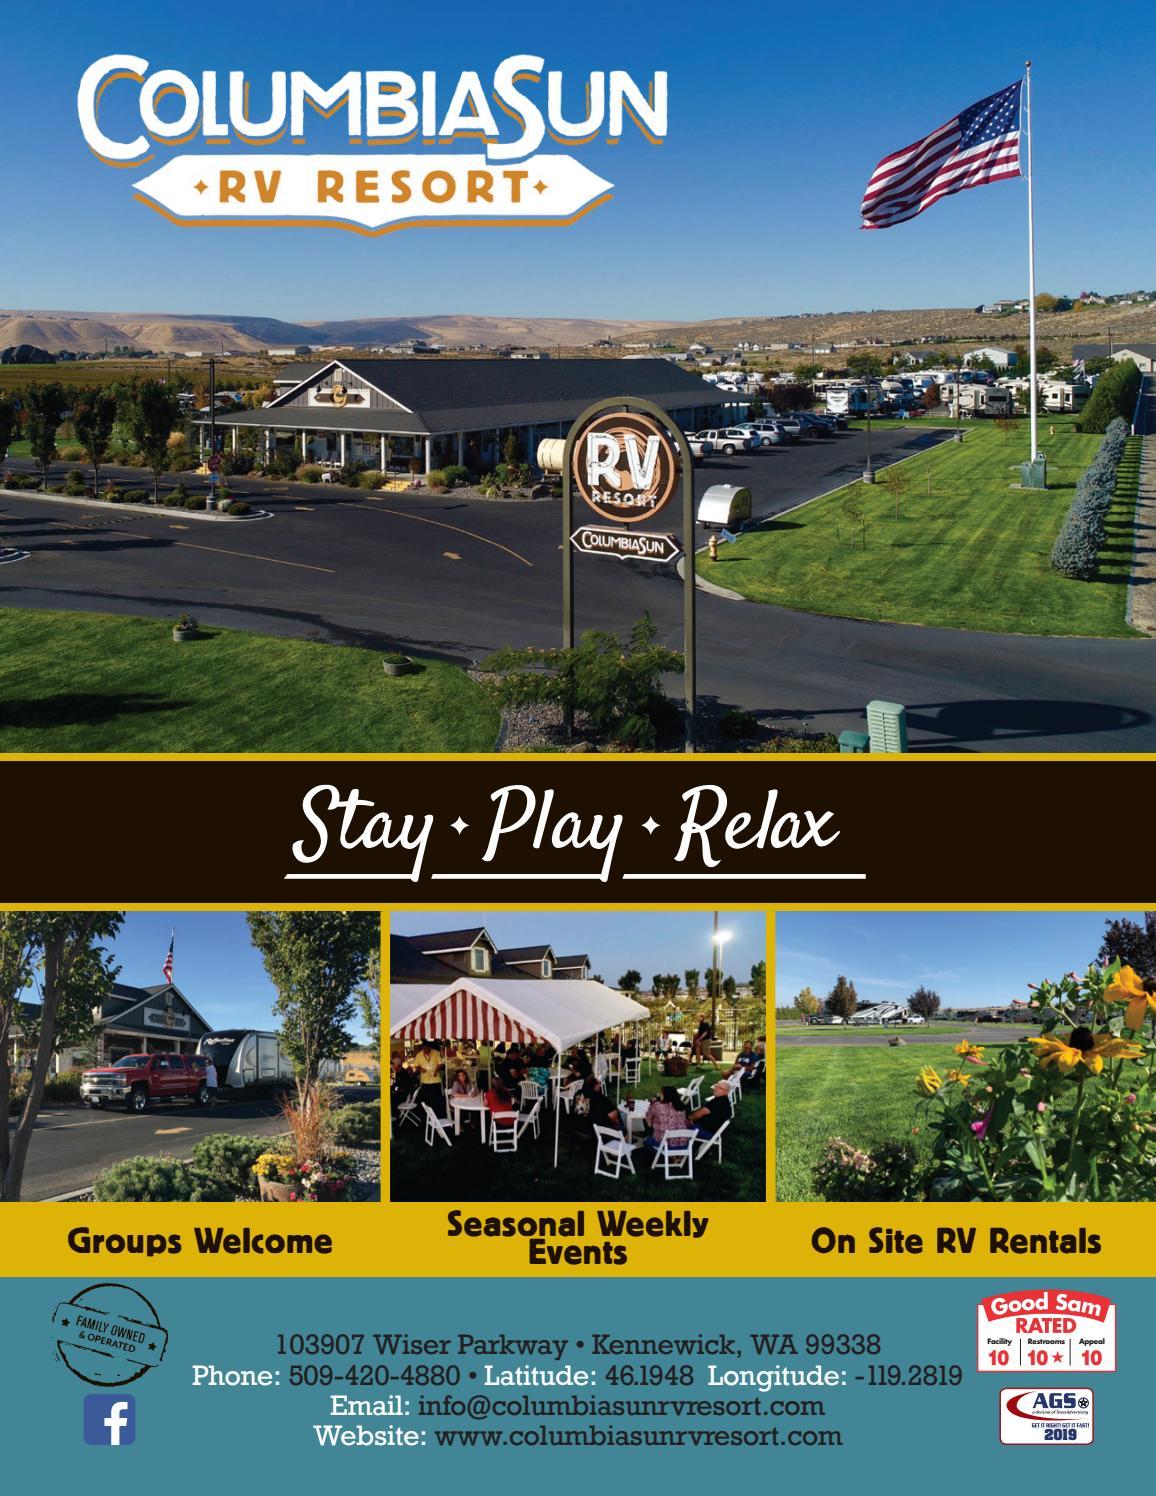 Columbia Sun Rv Resort By Ags Texas Advertising Issuu